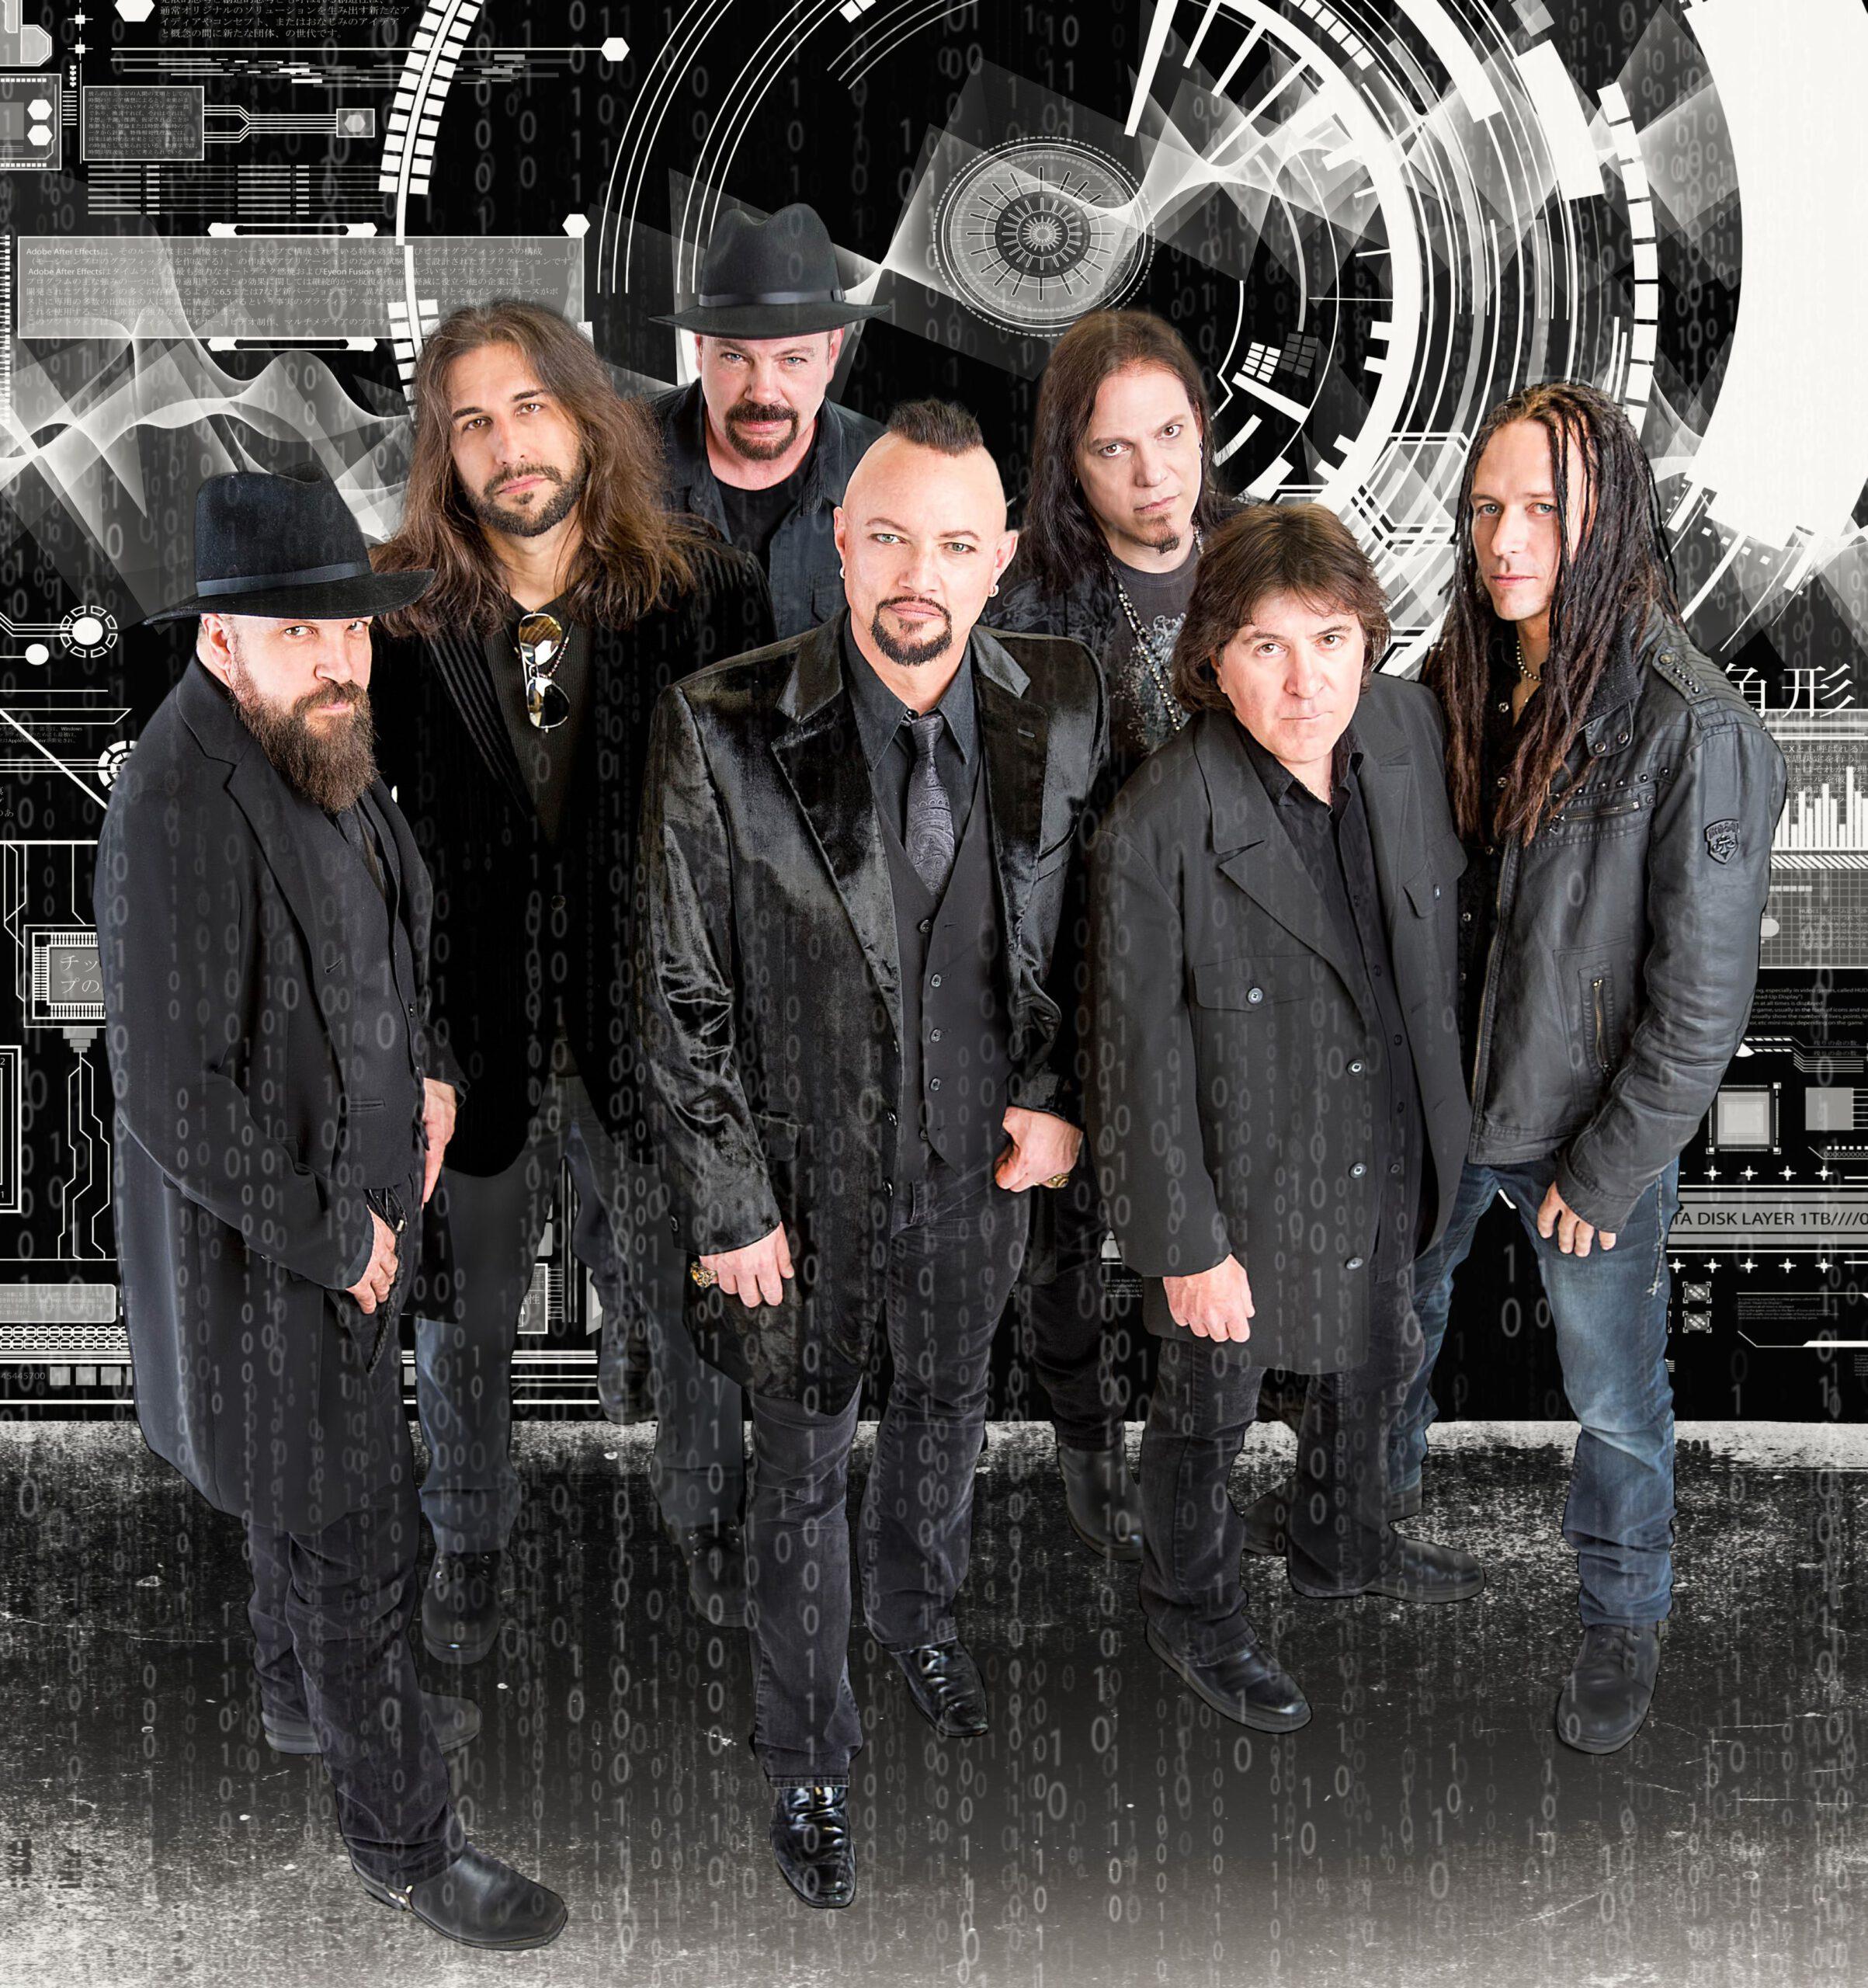 group20- noise crop 75